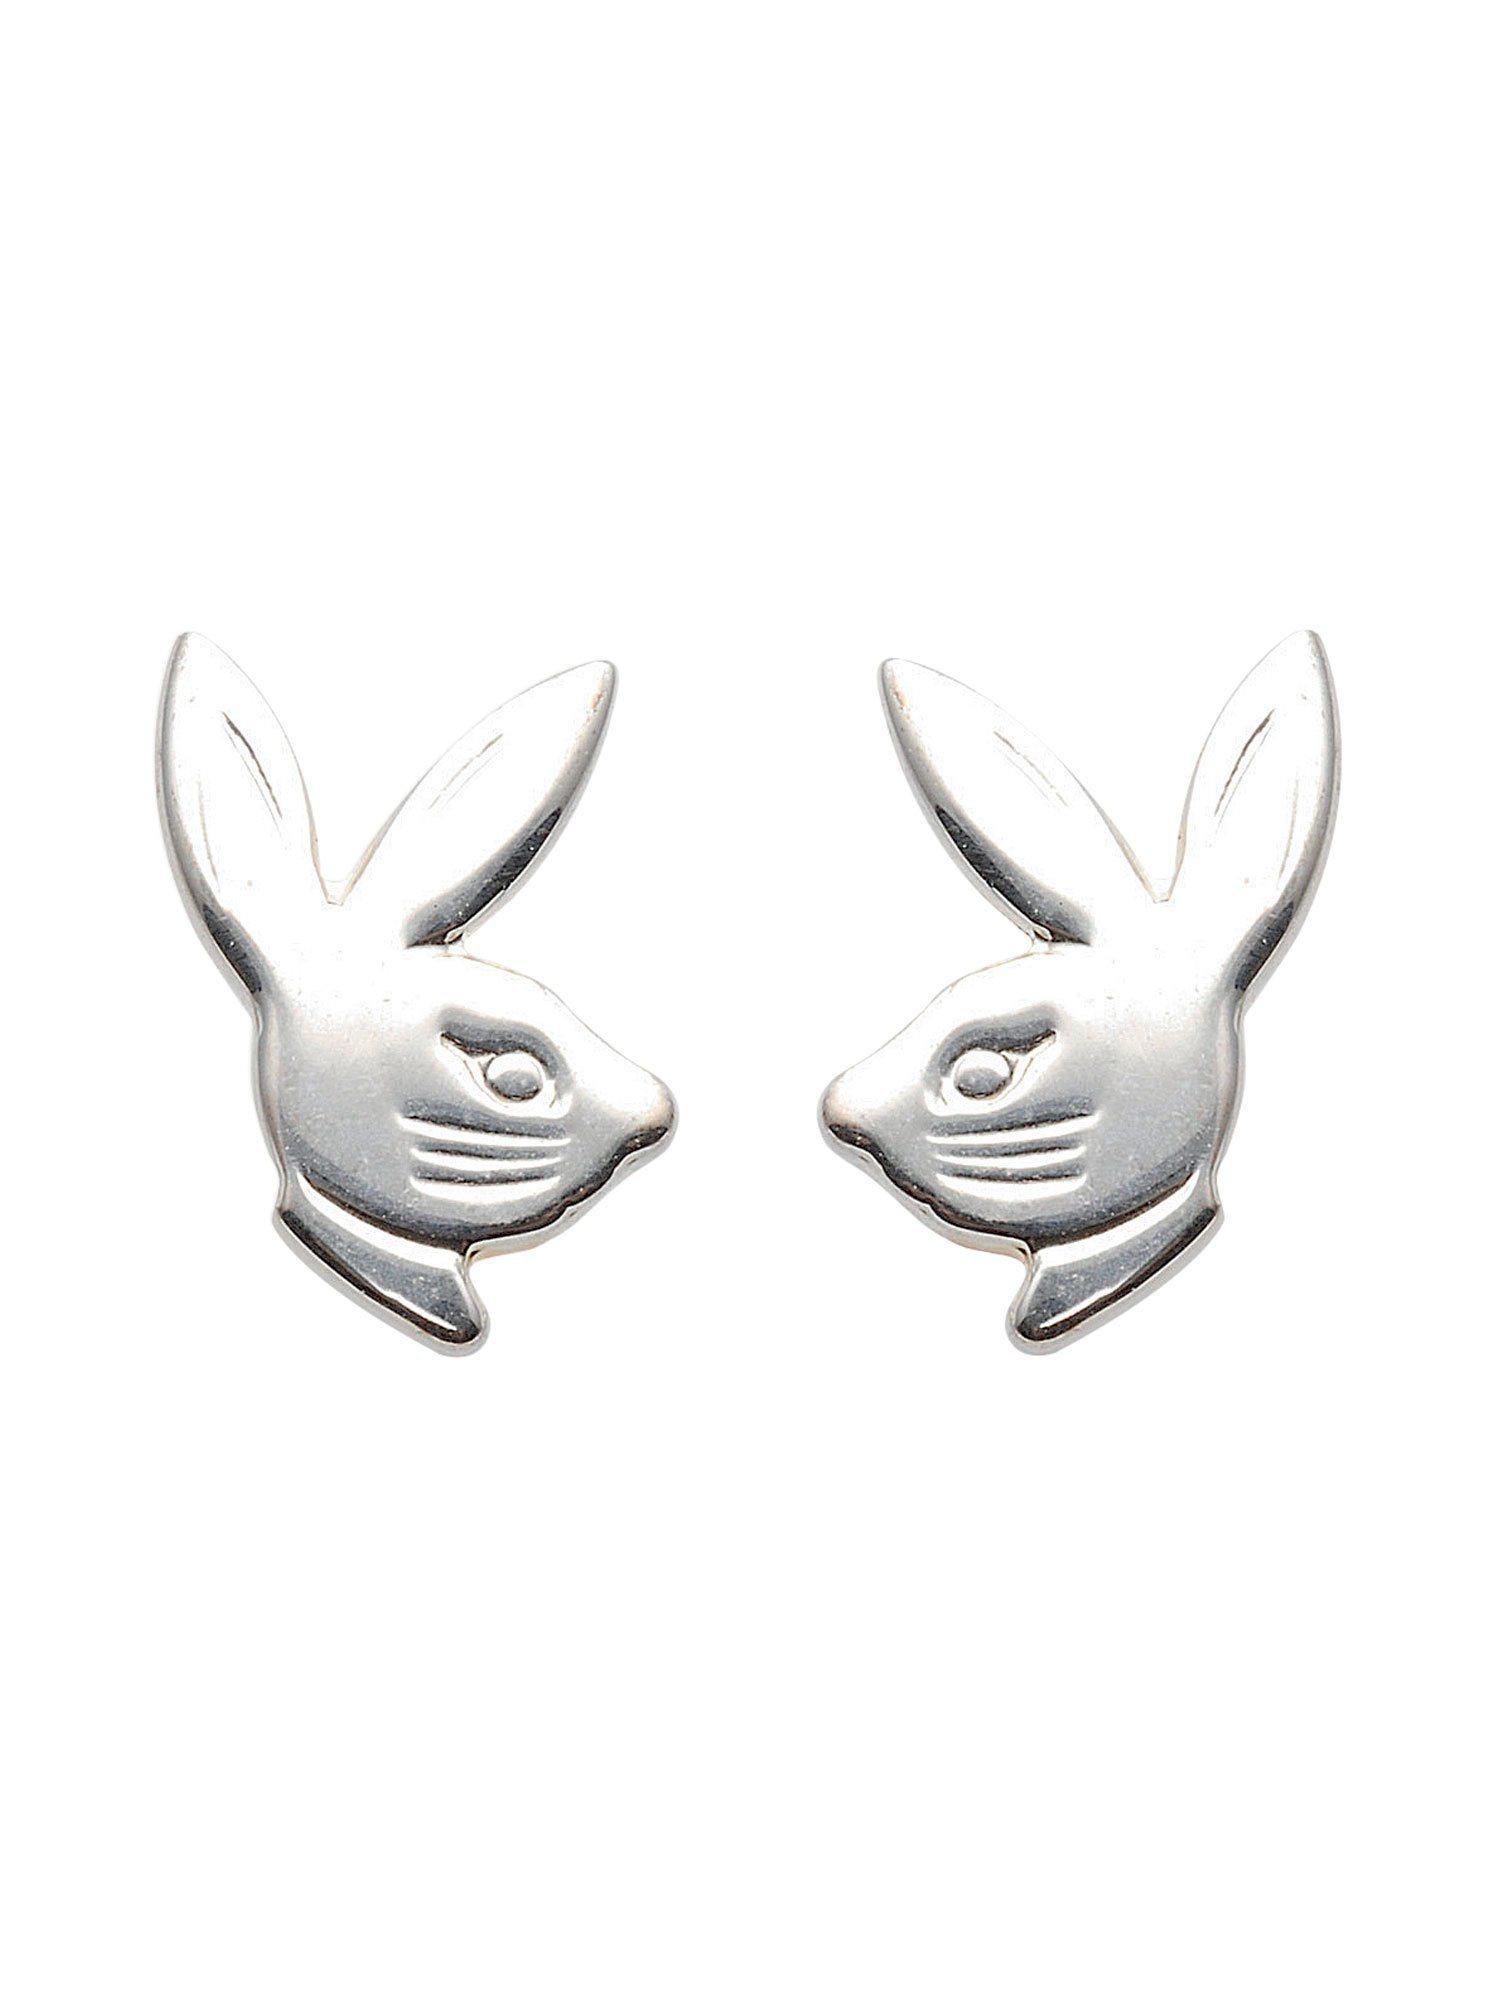 Adelia´s Paar Ohrstecker »Silber Ohrringe« Hasenkopf 925 Sterling Silber | Schmuck > Ohrschmuck & Ohrringe > Ohrstecker | Silber | Adelia´s